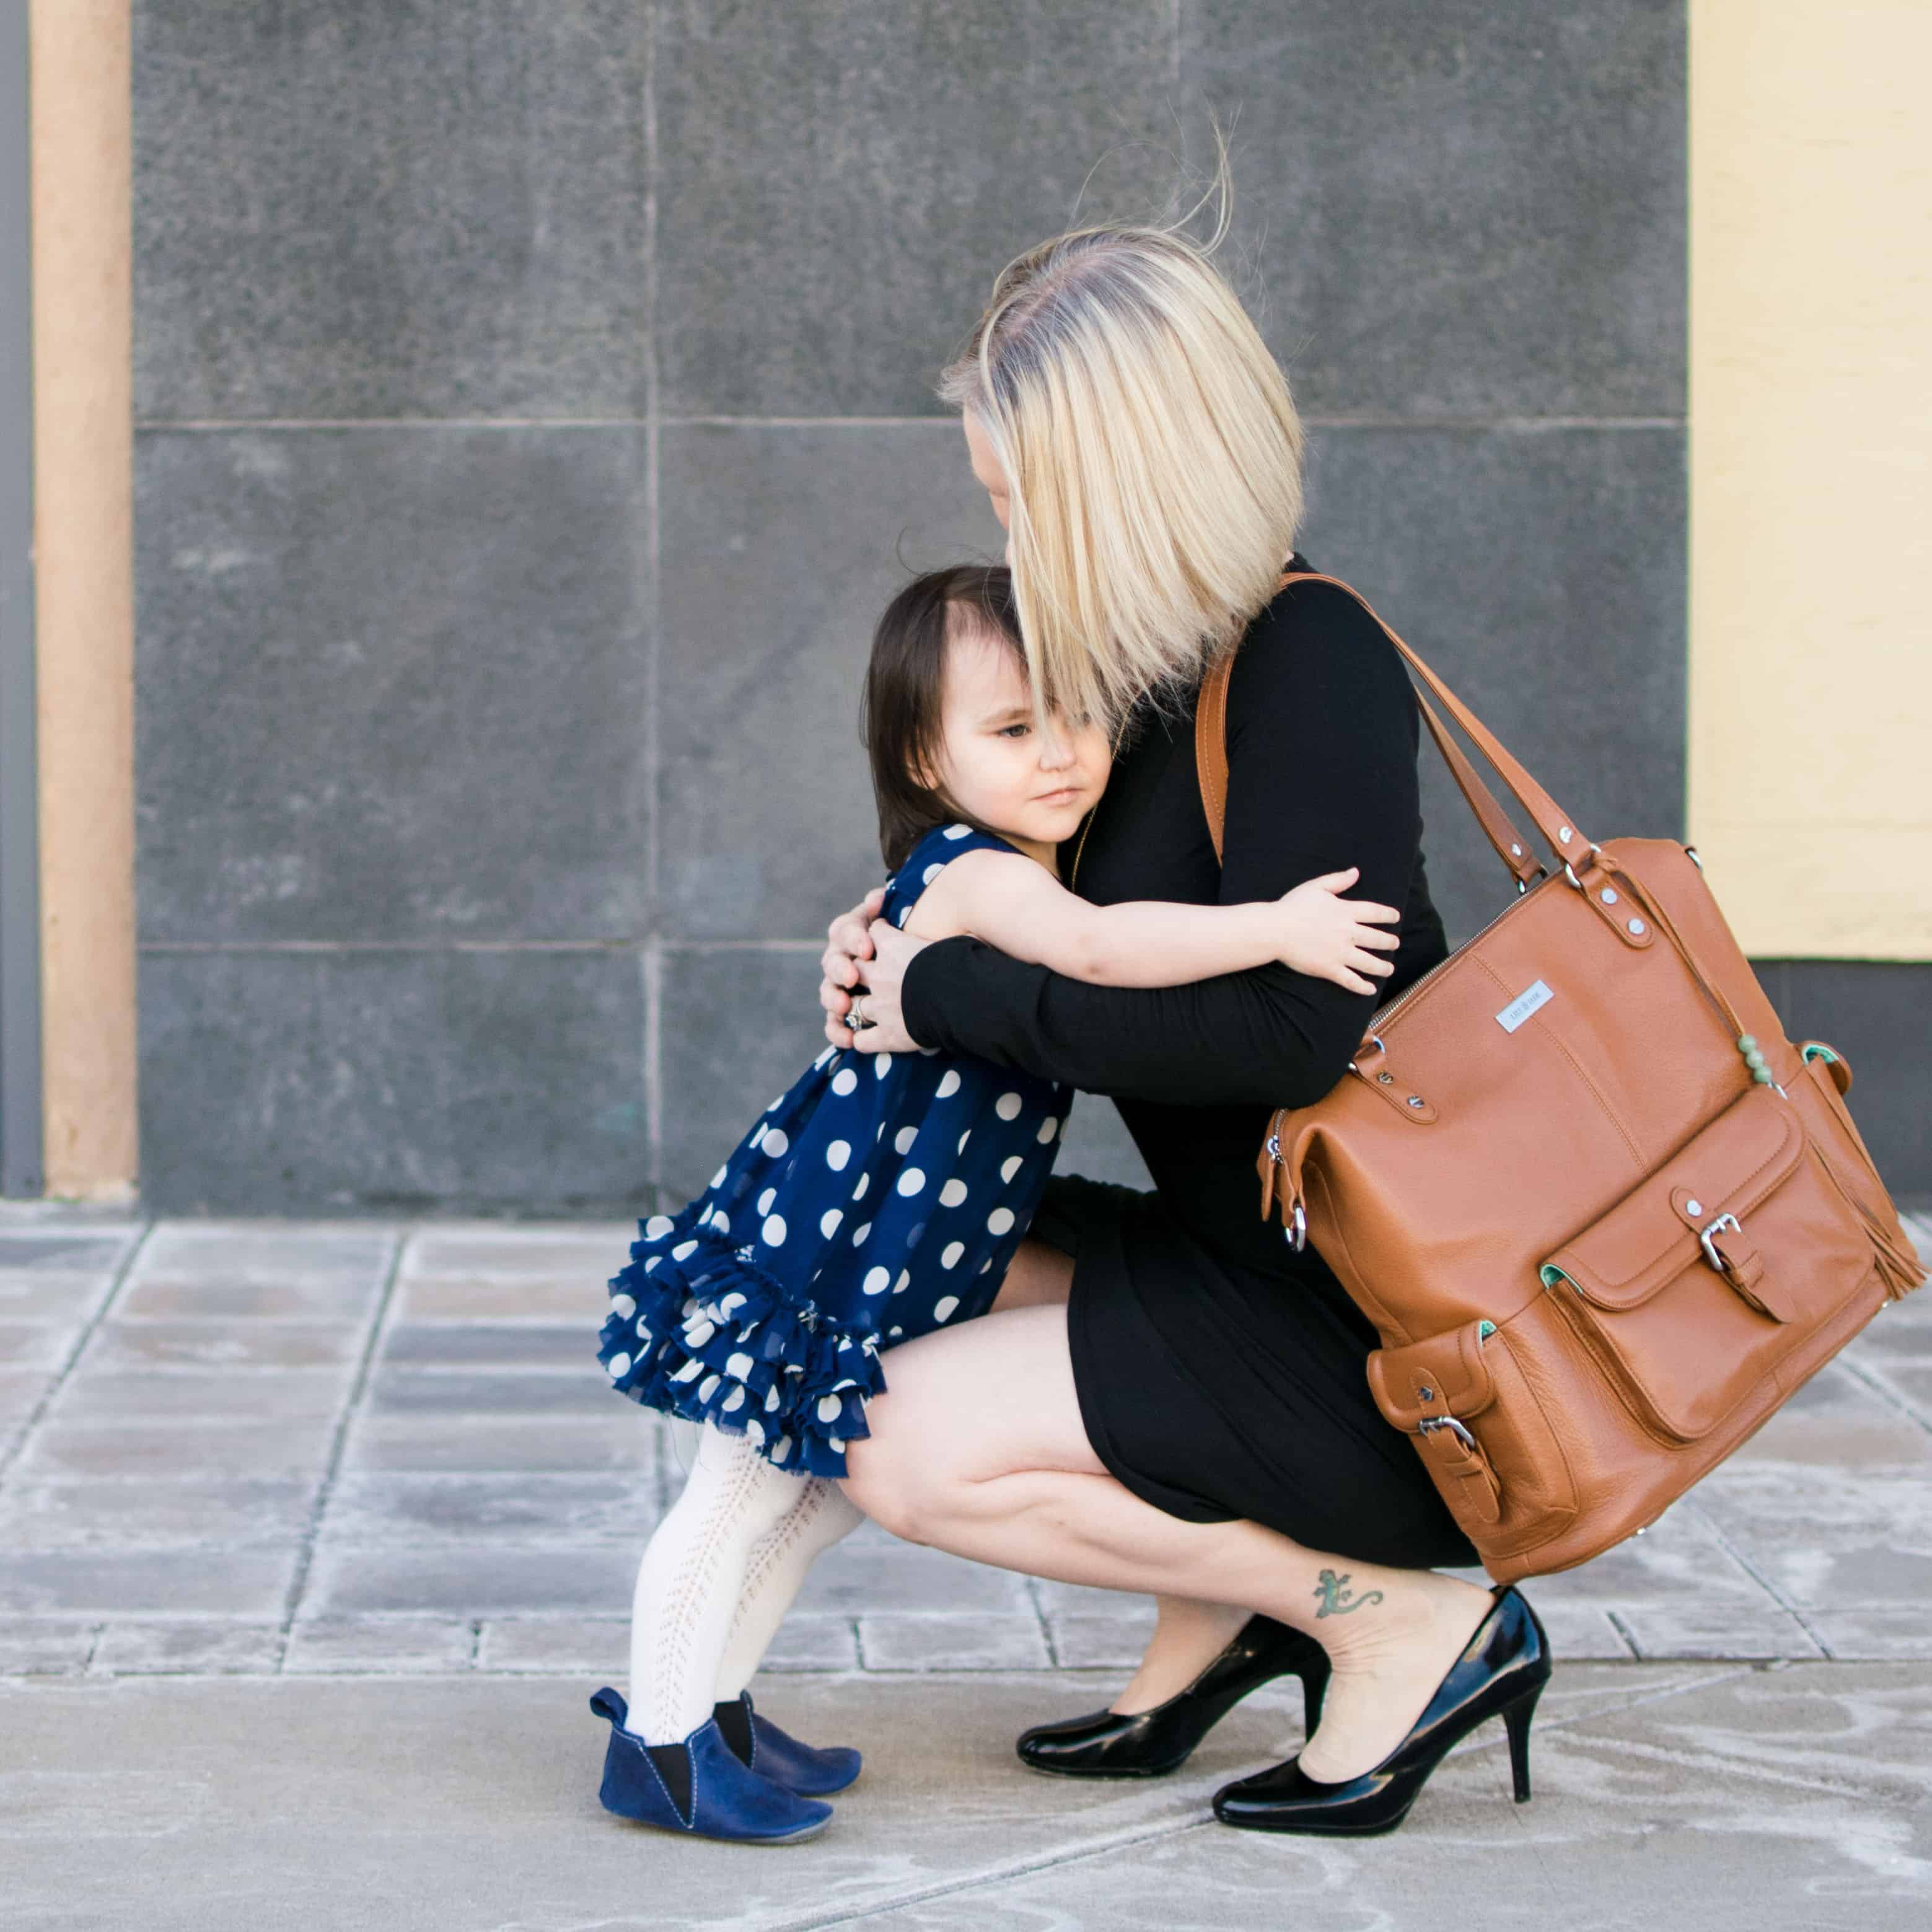 Momblogger Amanda Seghetti hugging 2 year old while carrying Lily Jade diaper bag